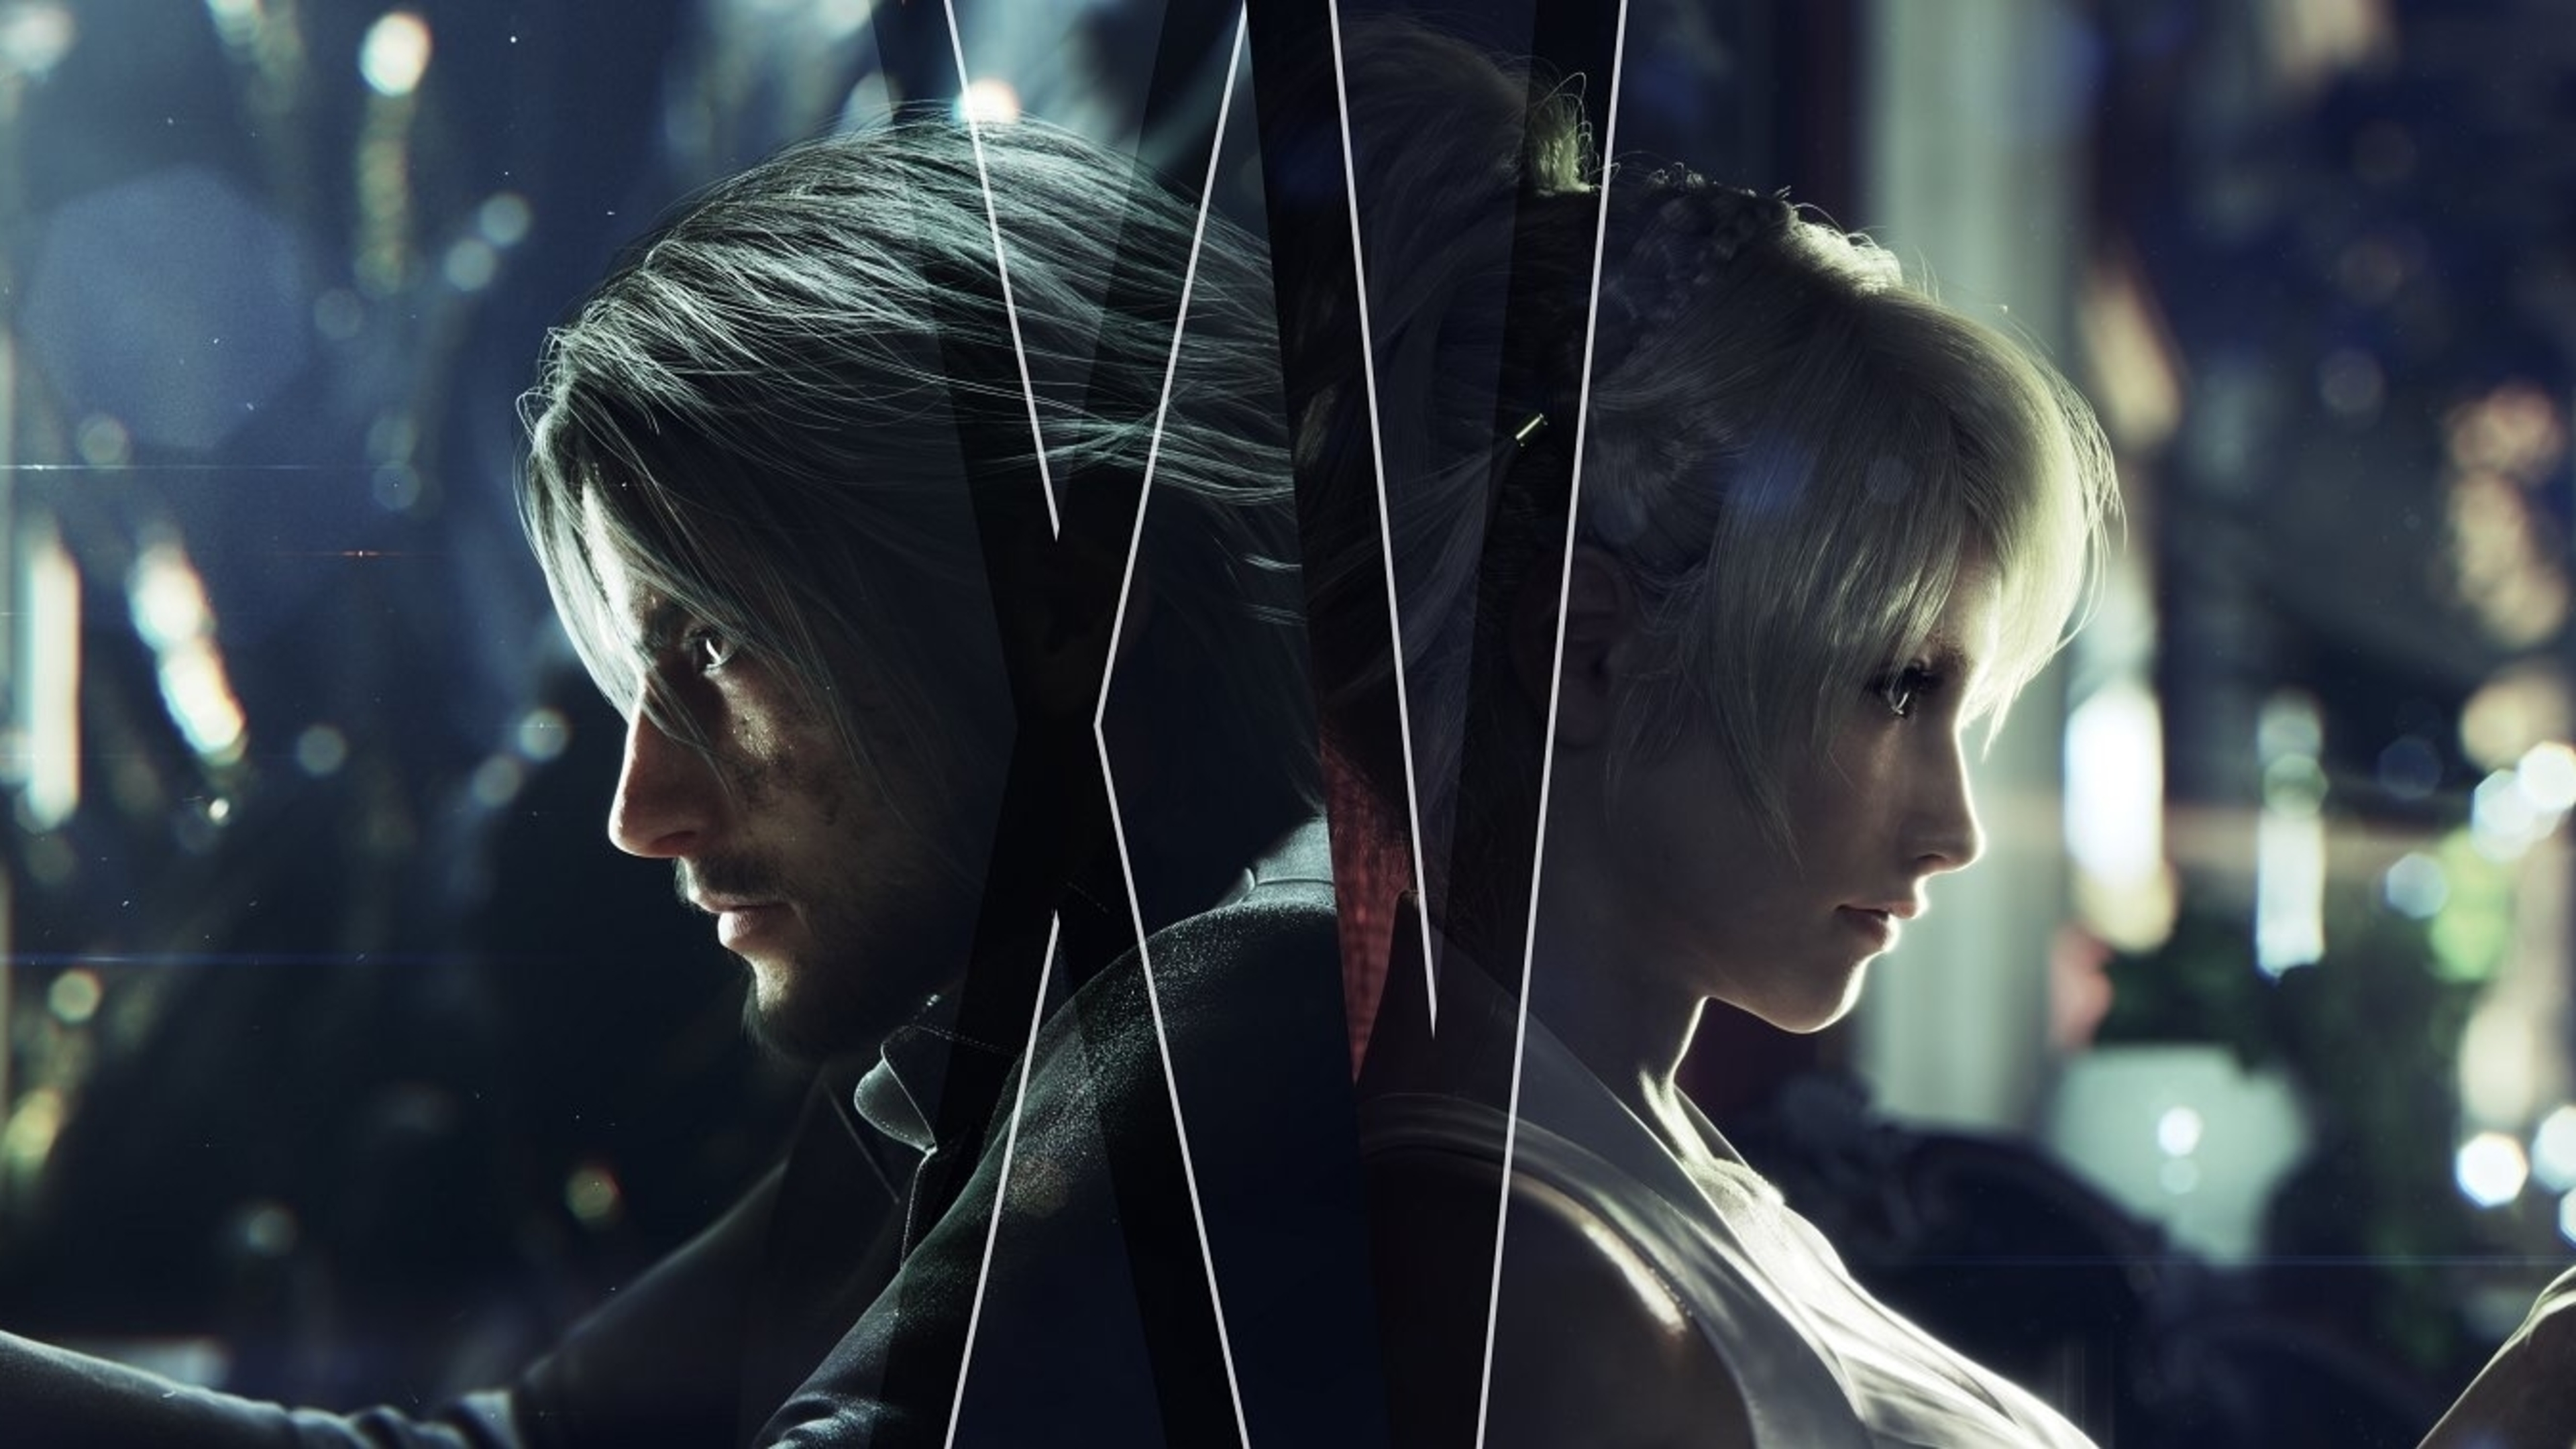 4k Noctis Lucis Caelum Final Fantasy Xv Hd Games 4k: FF XV Noctis & Luna